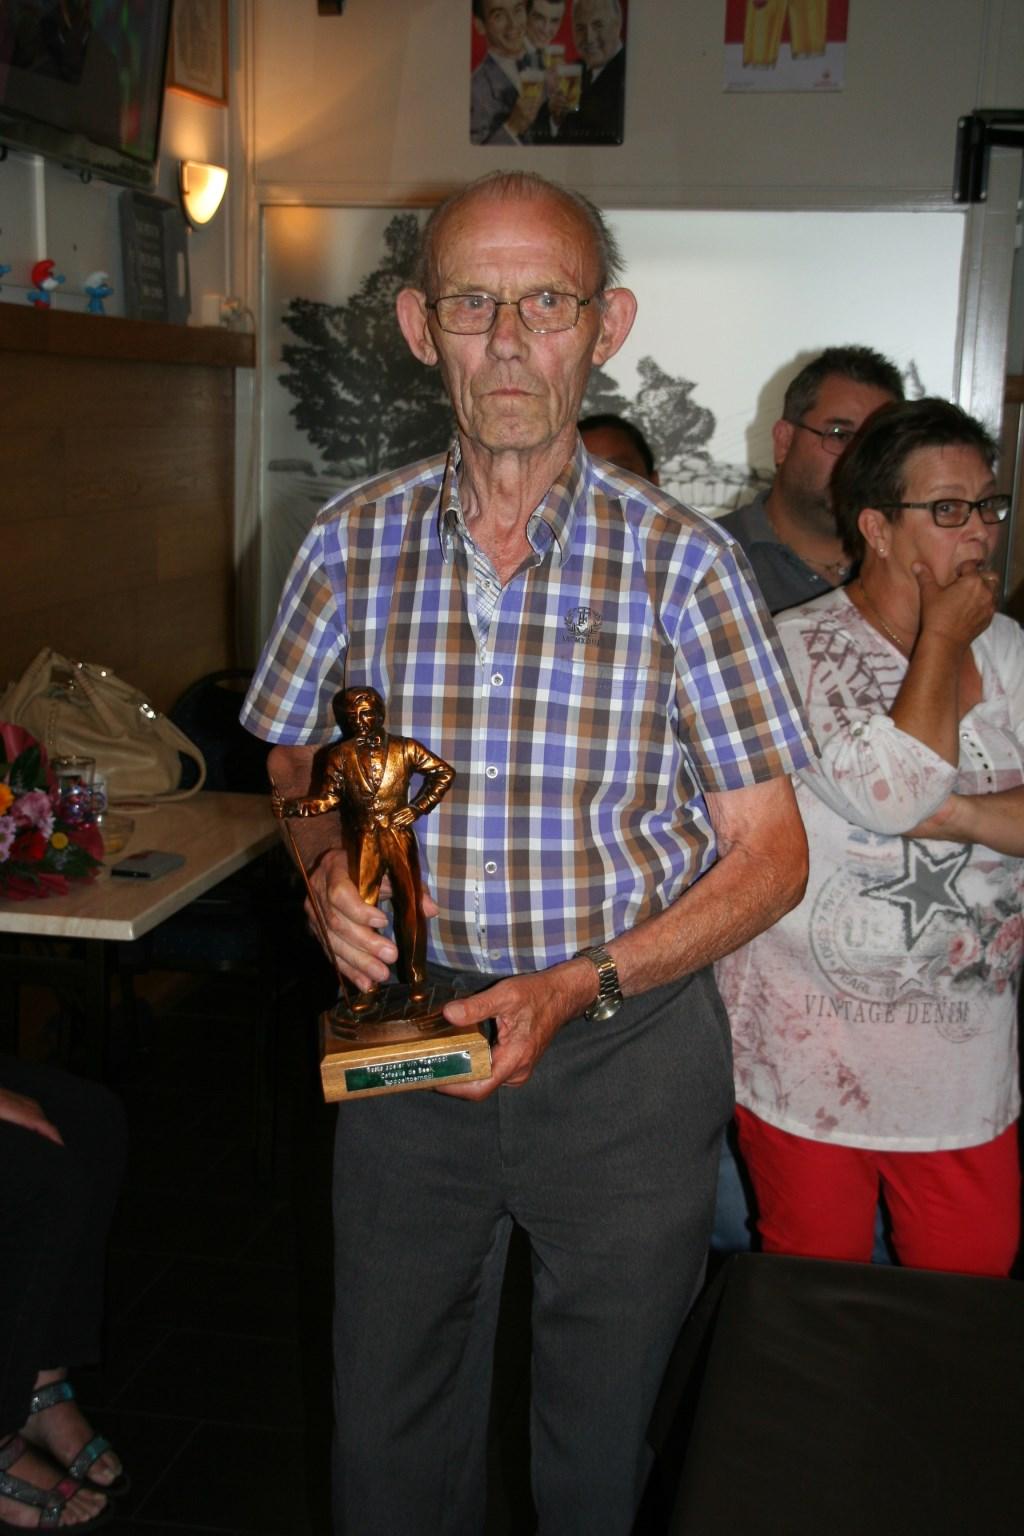 Rinus Koevoets (89) Beste speler van het toernooi Foto: Jeroen © Minerve Pers